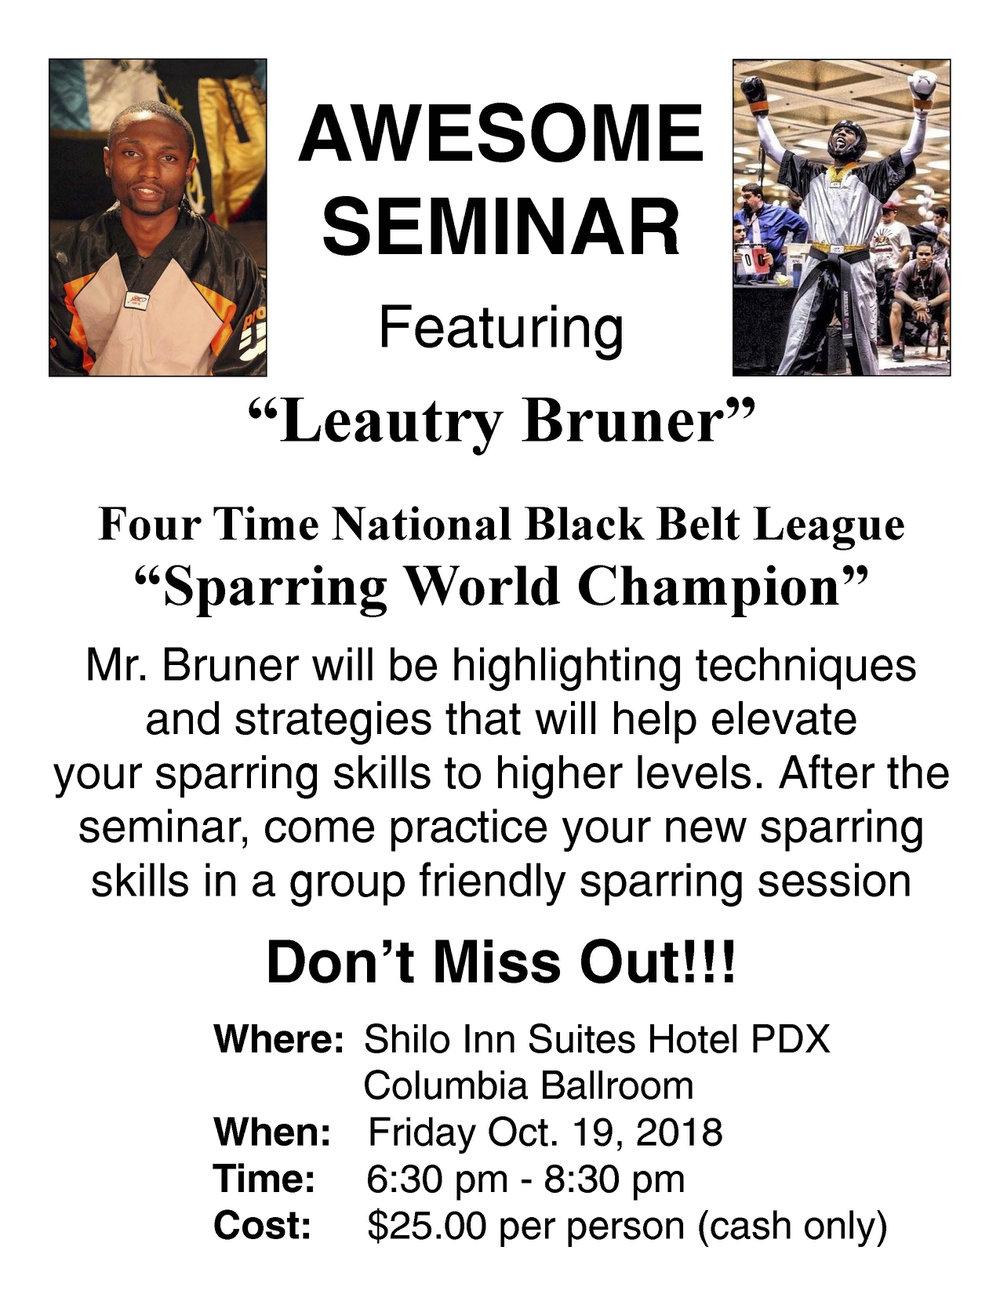 Awesome Seminar Flyer - 8-2018.jpg